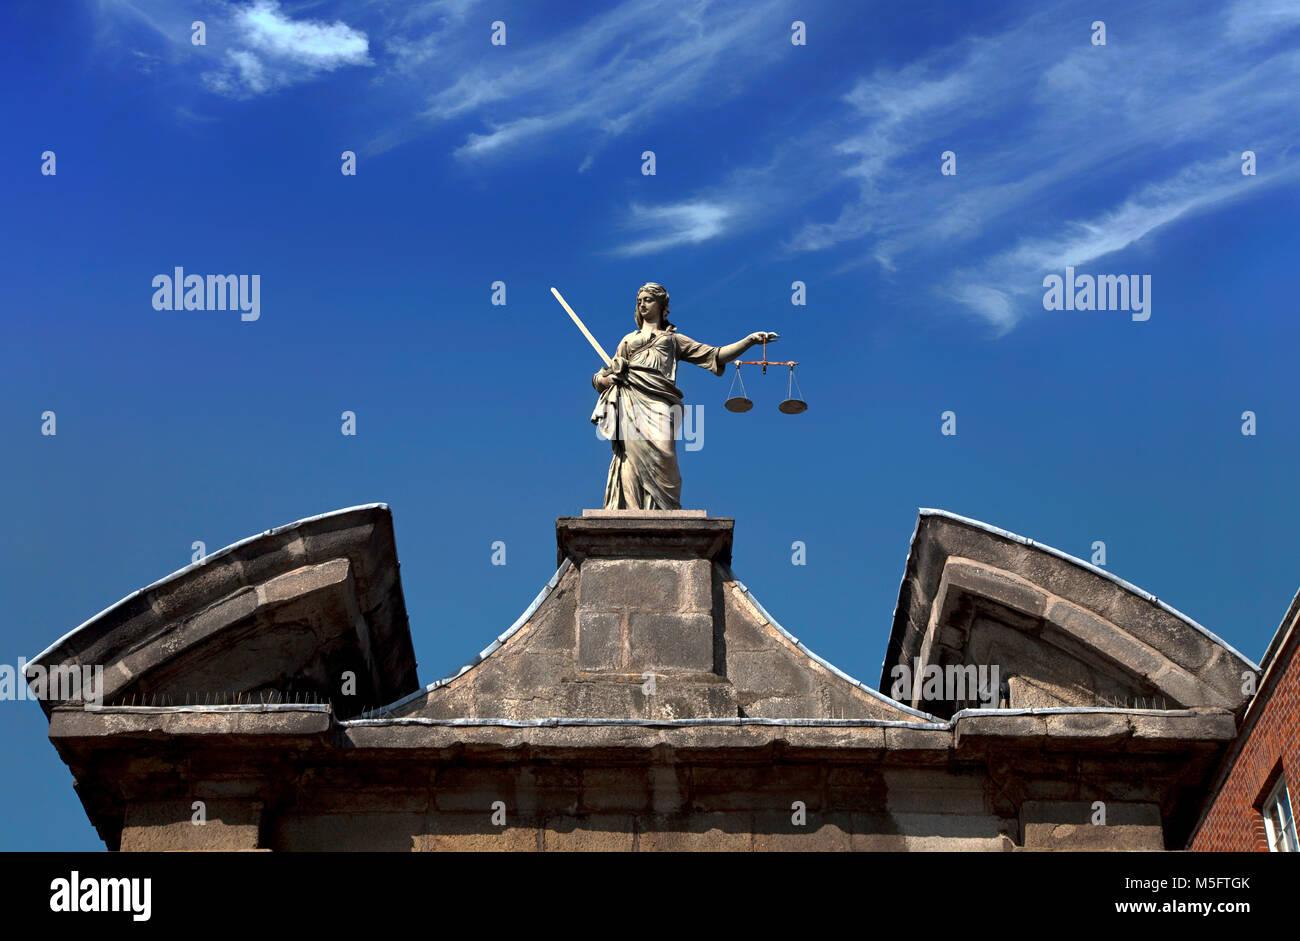 Sculpture of  (Scales of) Justice aka Iustitia, Justitia or Lady Justice (Latin: Iustitia, the Roman goddess of - Stock Image